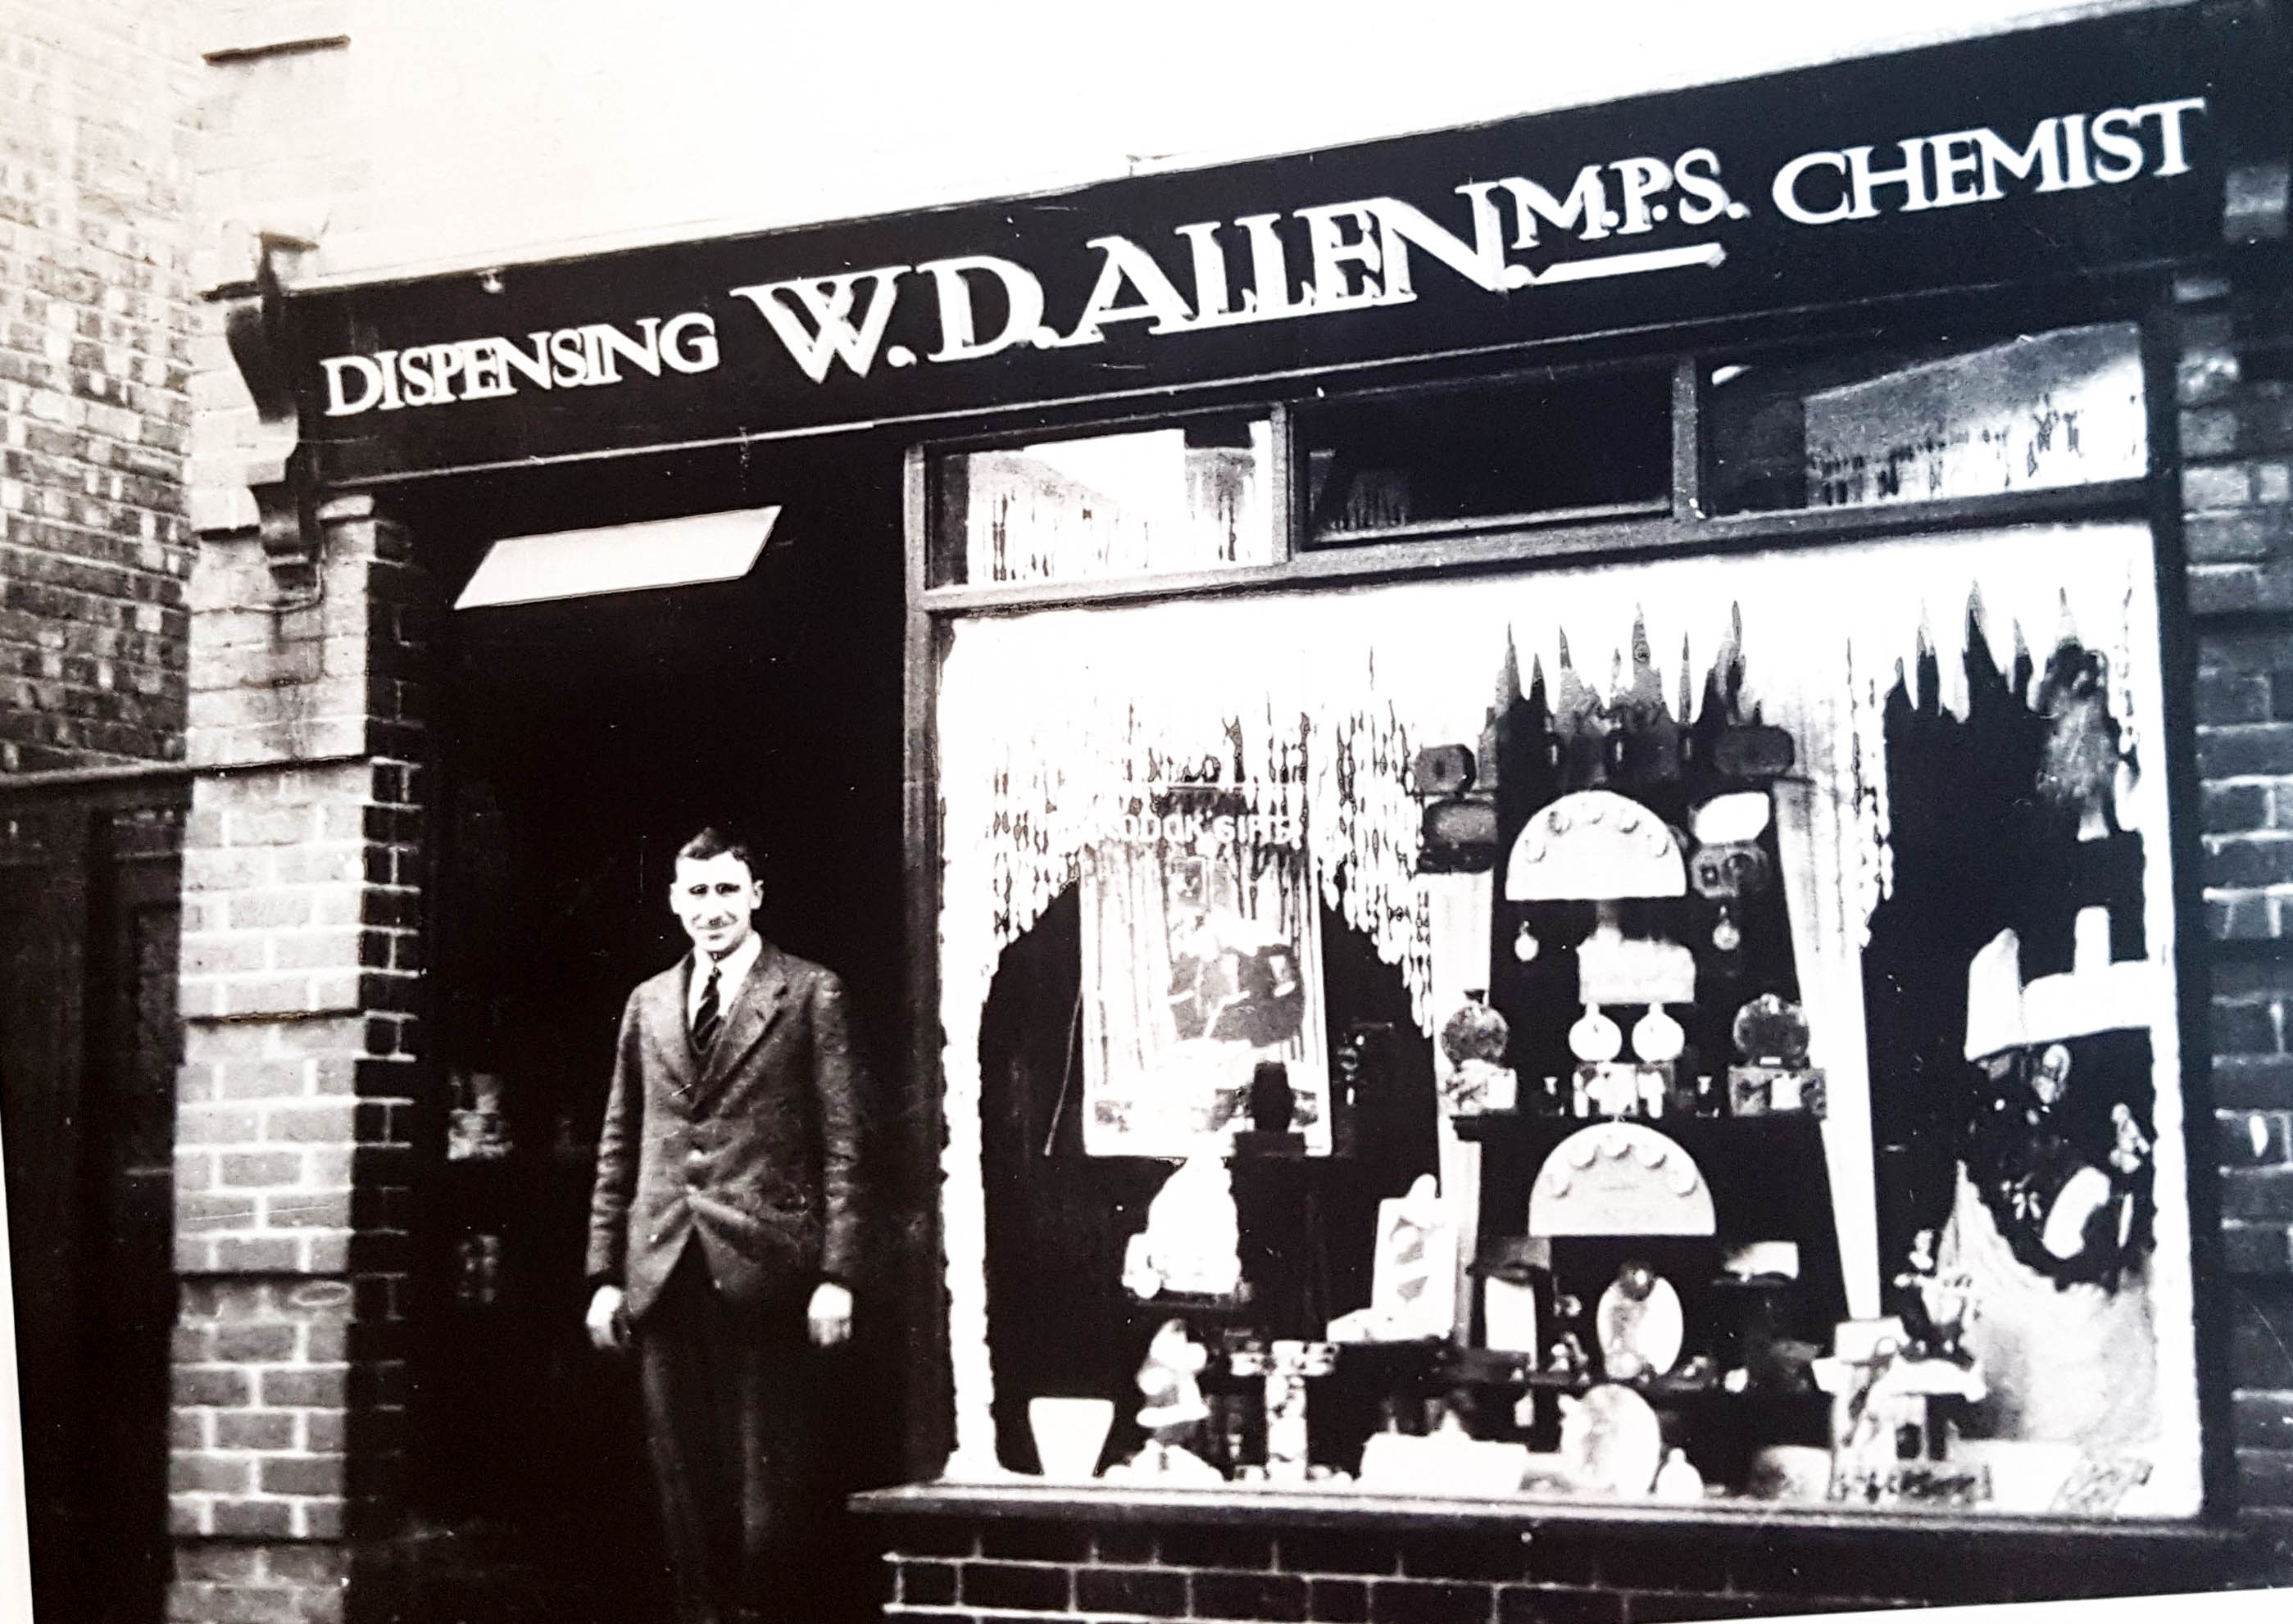 WDAllen-1928.jpg